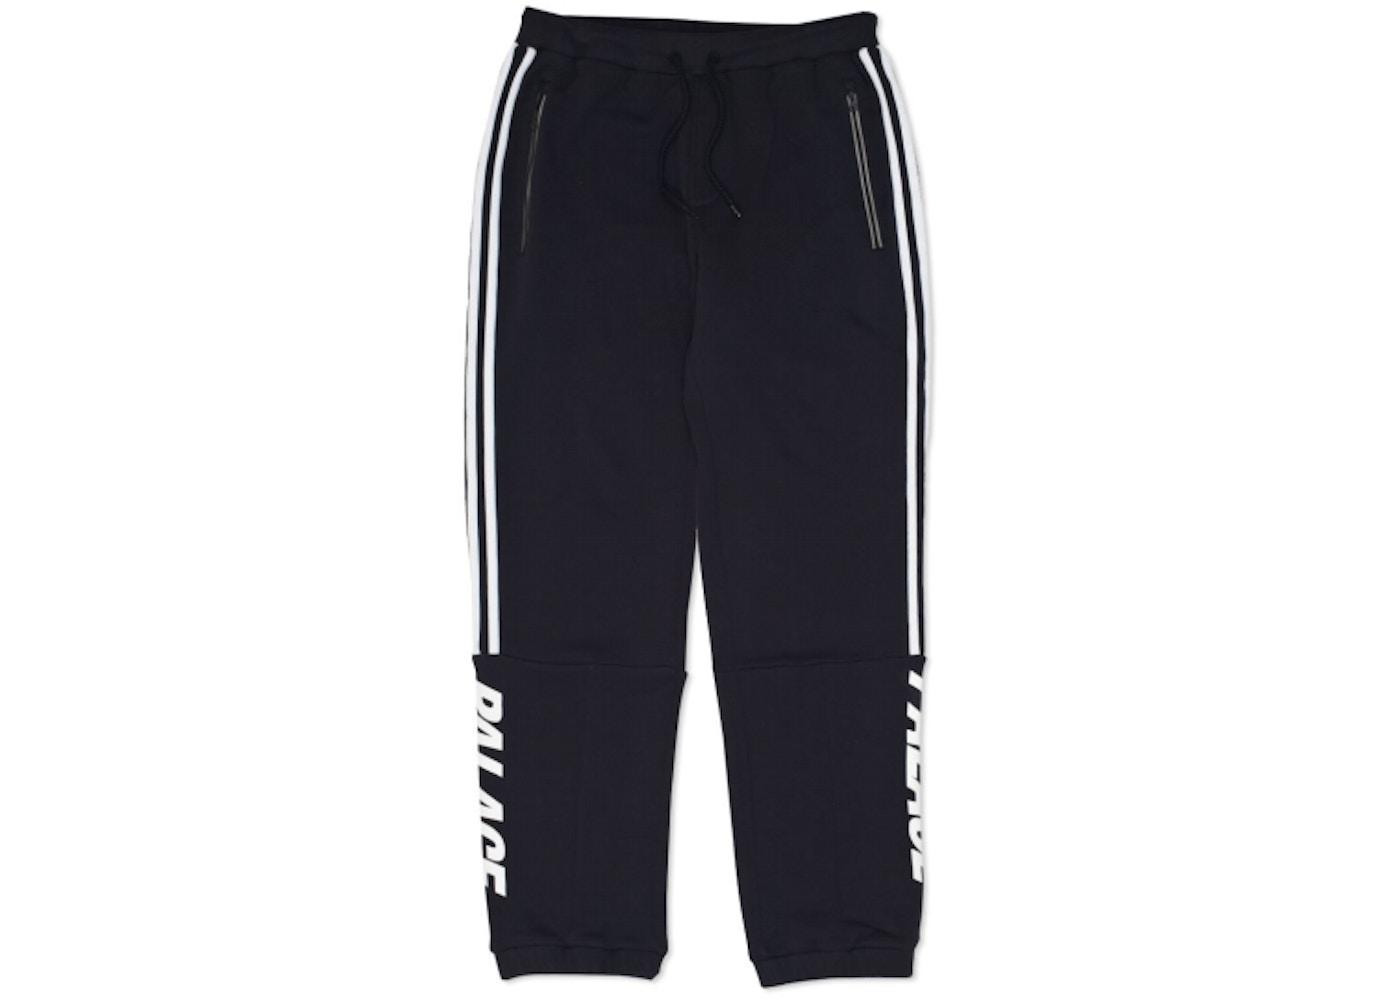 931013c0 Palace adidas Track Pant Black - Adidas Summer 2016